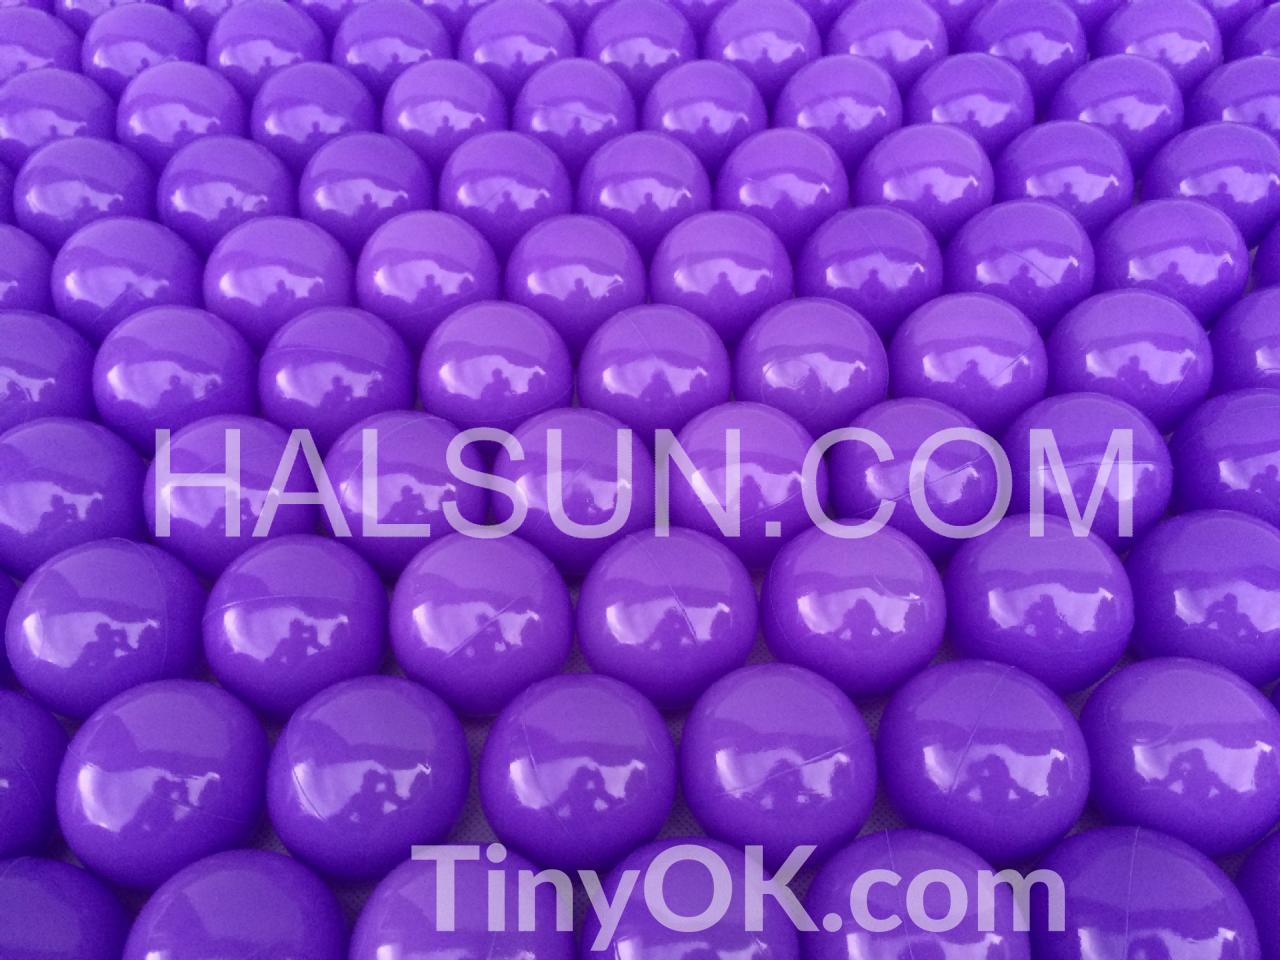 plastic-ocean-balls-4.jpg